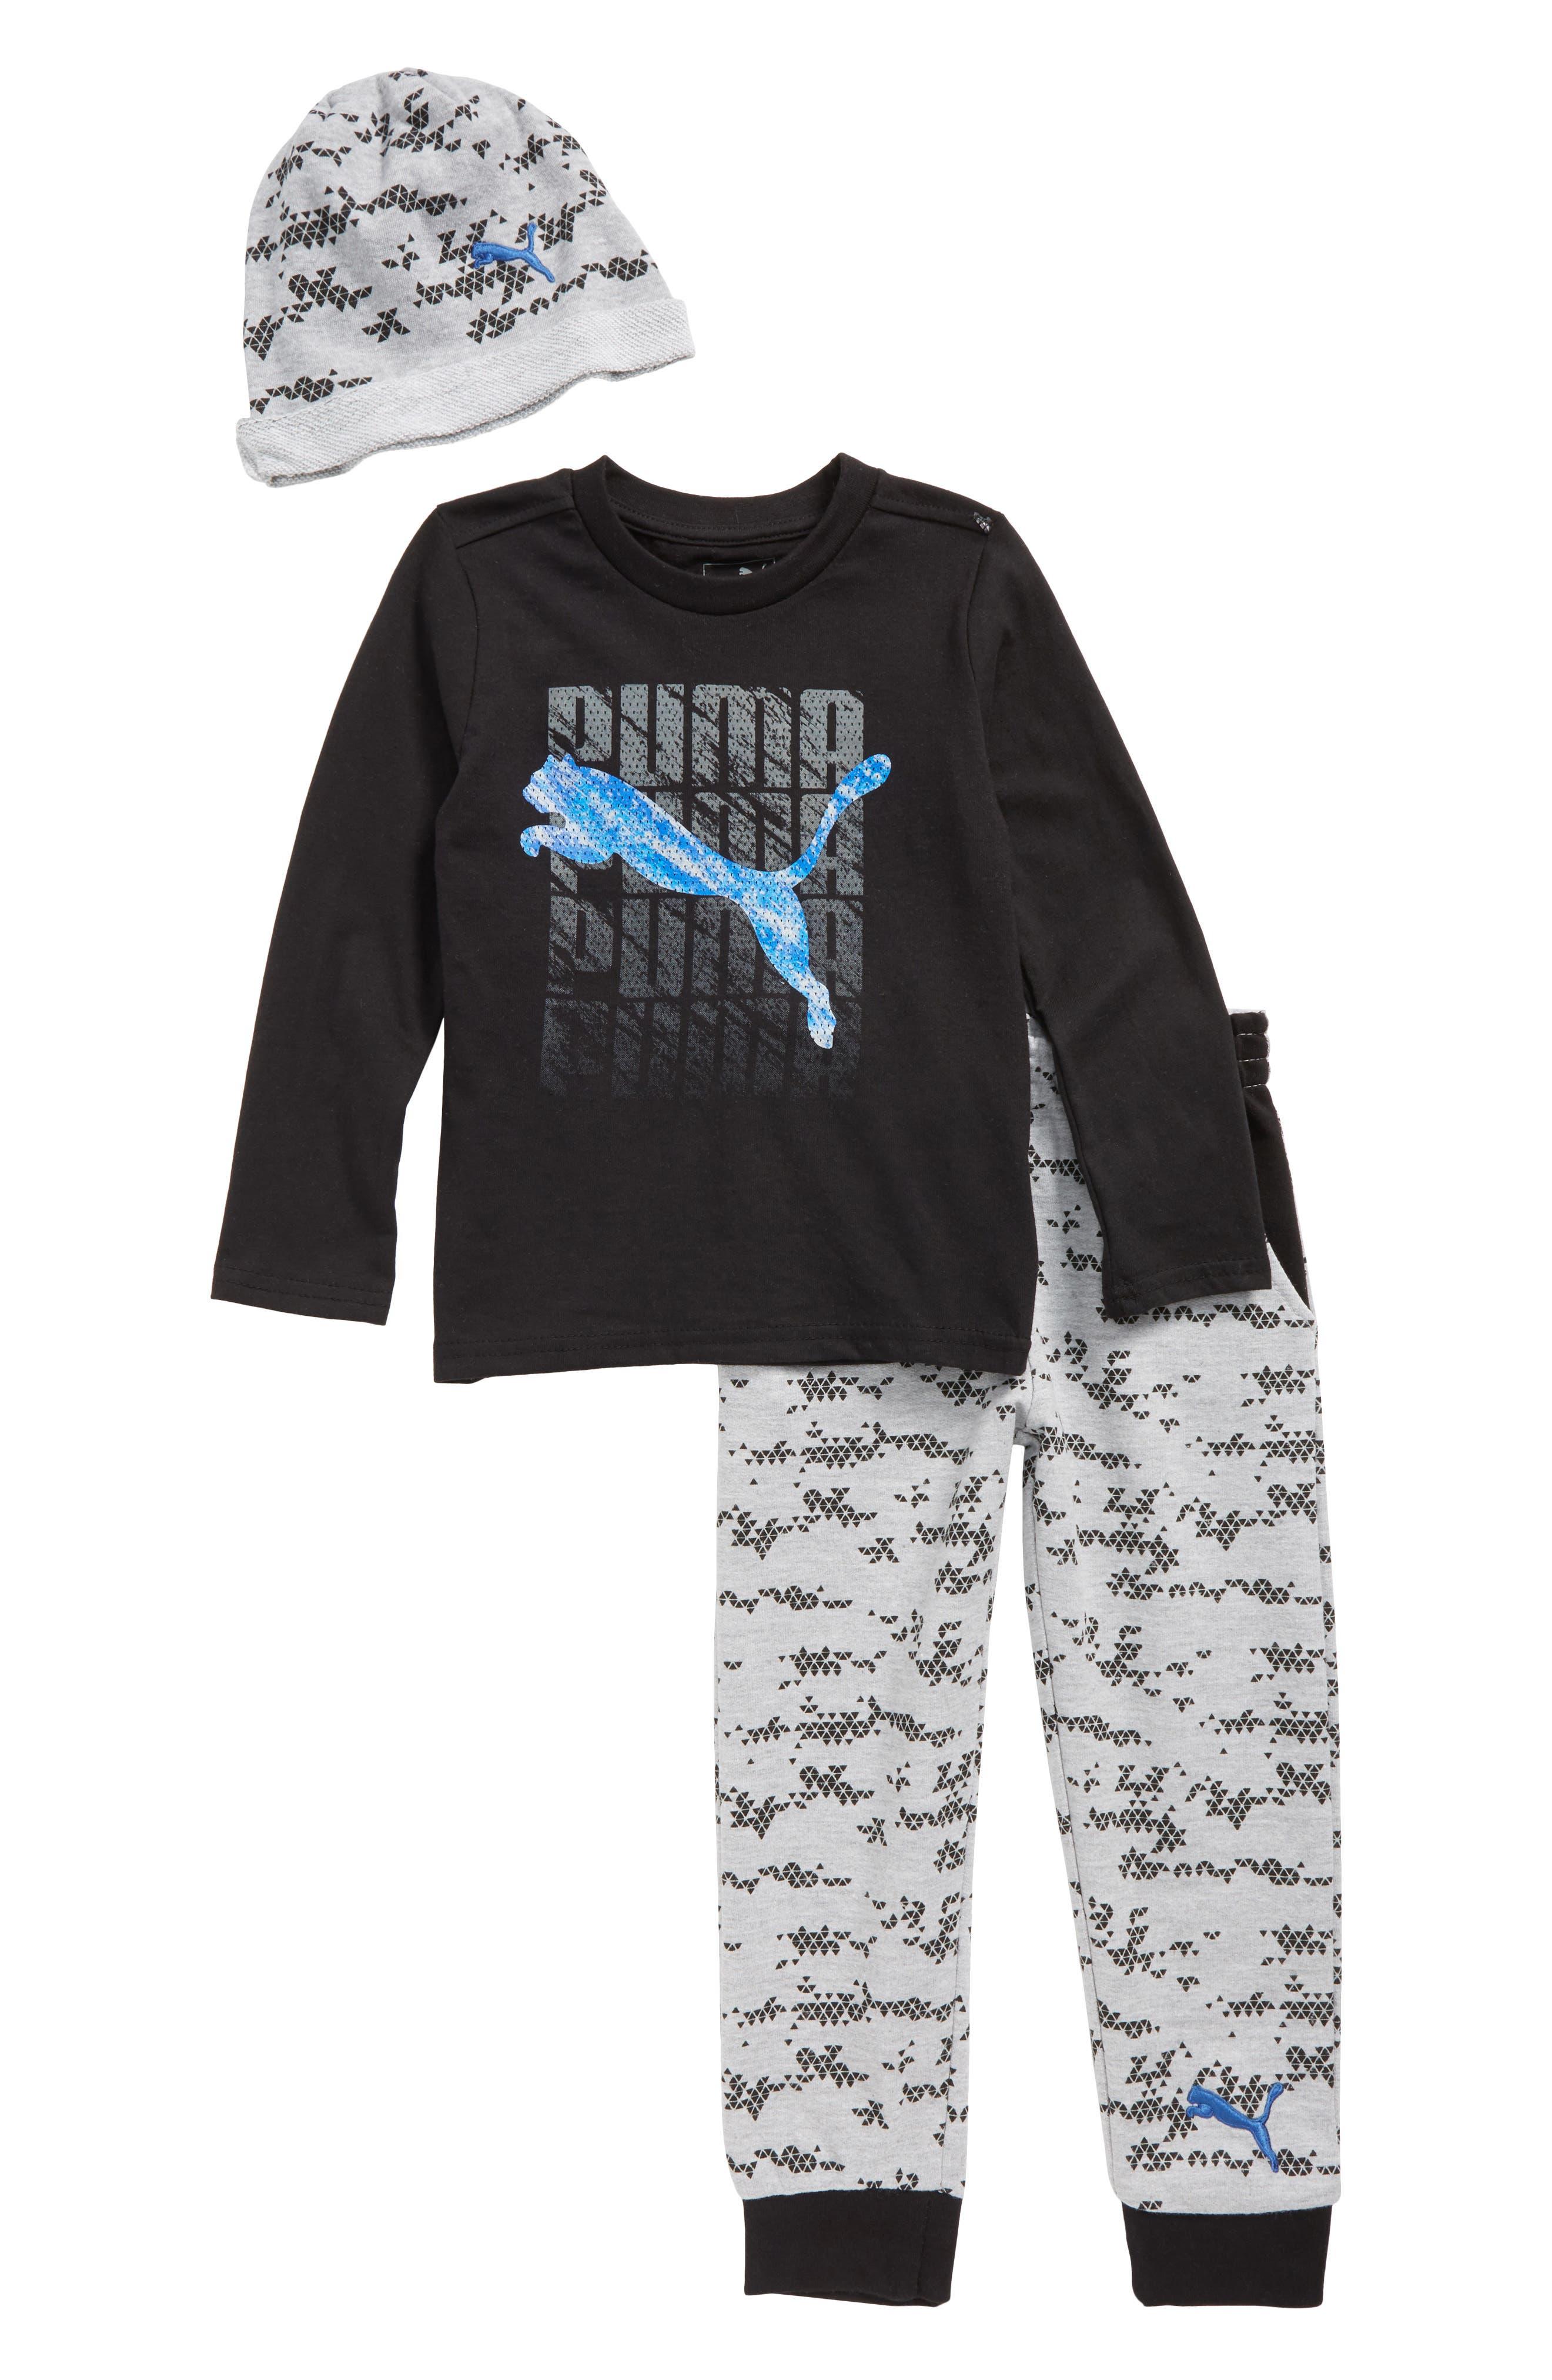 Main Image - PUMA Logo T-Shirt, Jogger Pants & Beanie Set (Toddler Boys & Little Boys)